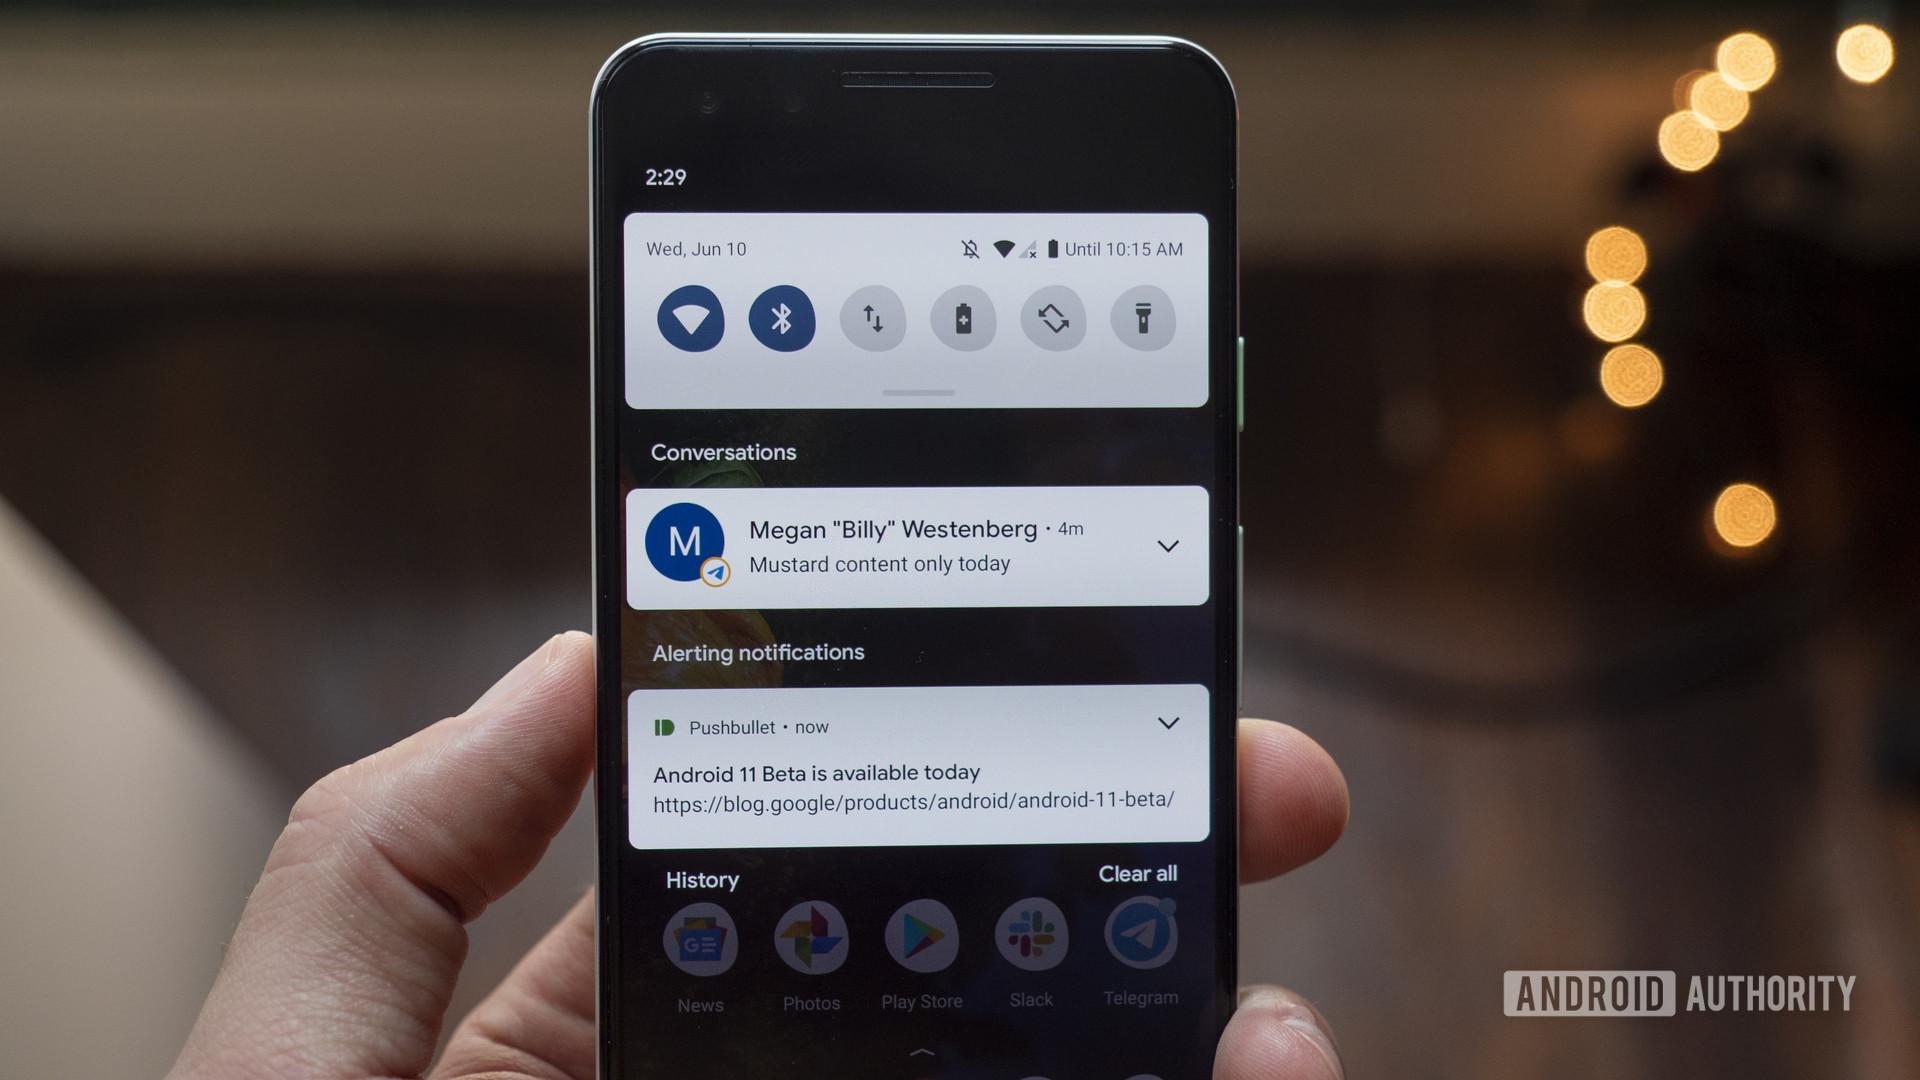 android 11 beta priority conversations telegram pushbullet 2